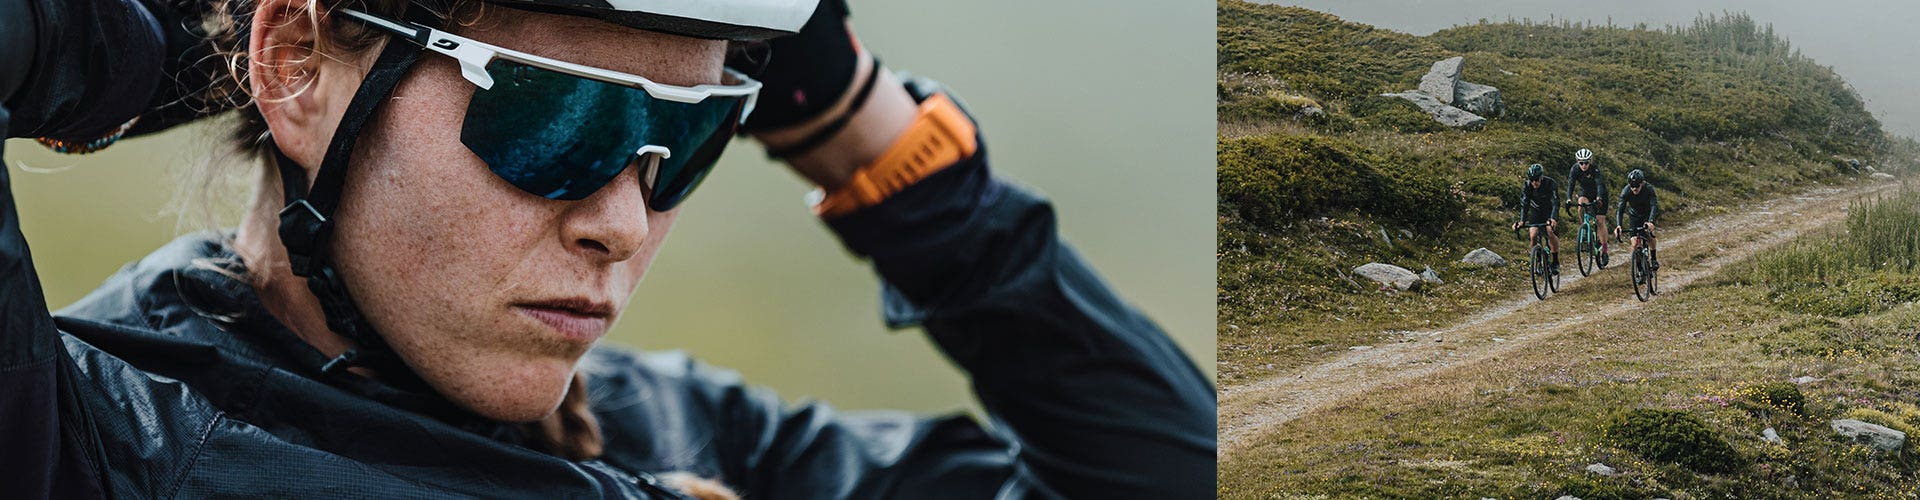 Nouveautés - Hommes - VTT - Trail running - Triathlon - Gravel Cycling